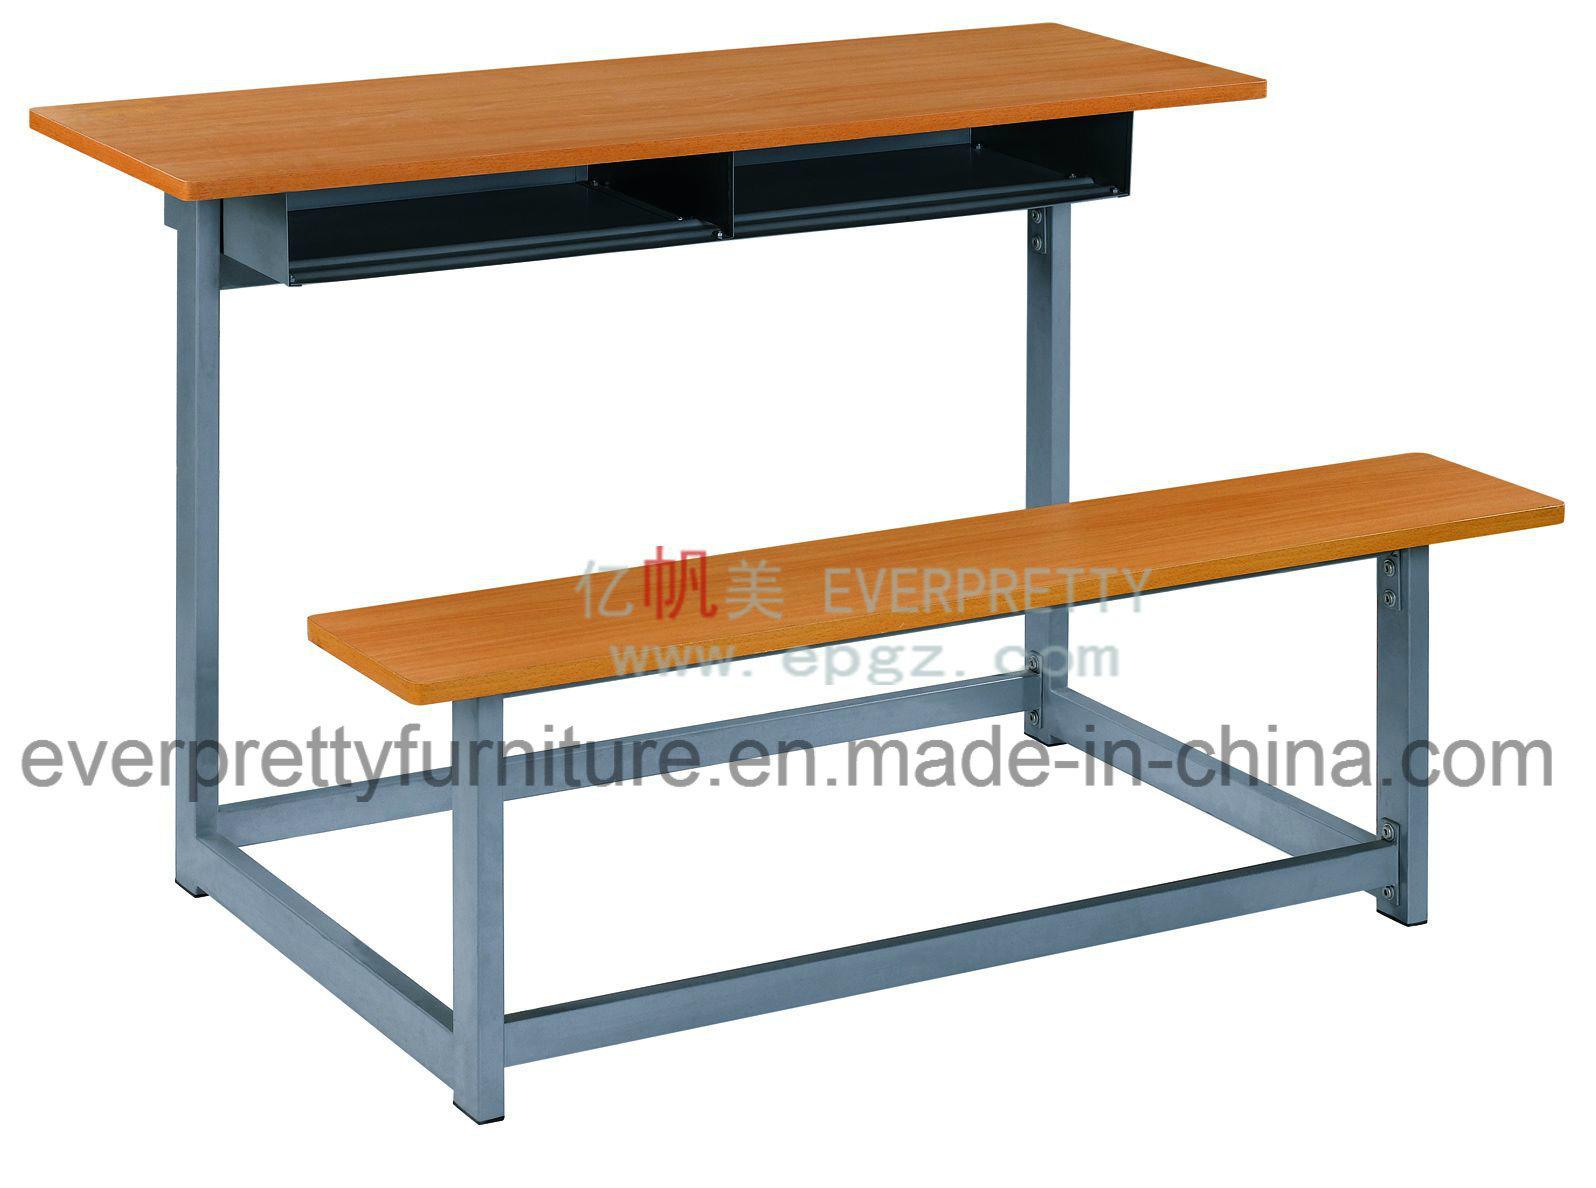 China Promotion Double School Desk Bench Furniture Set